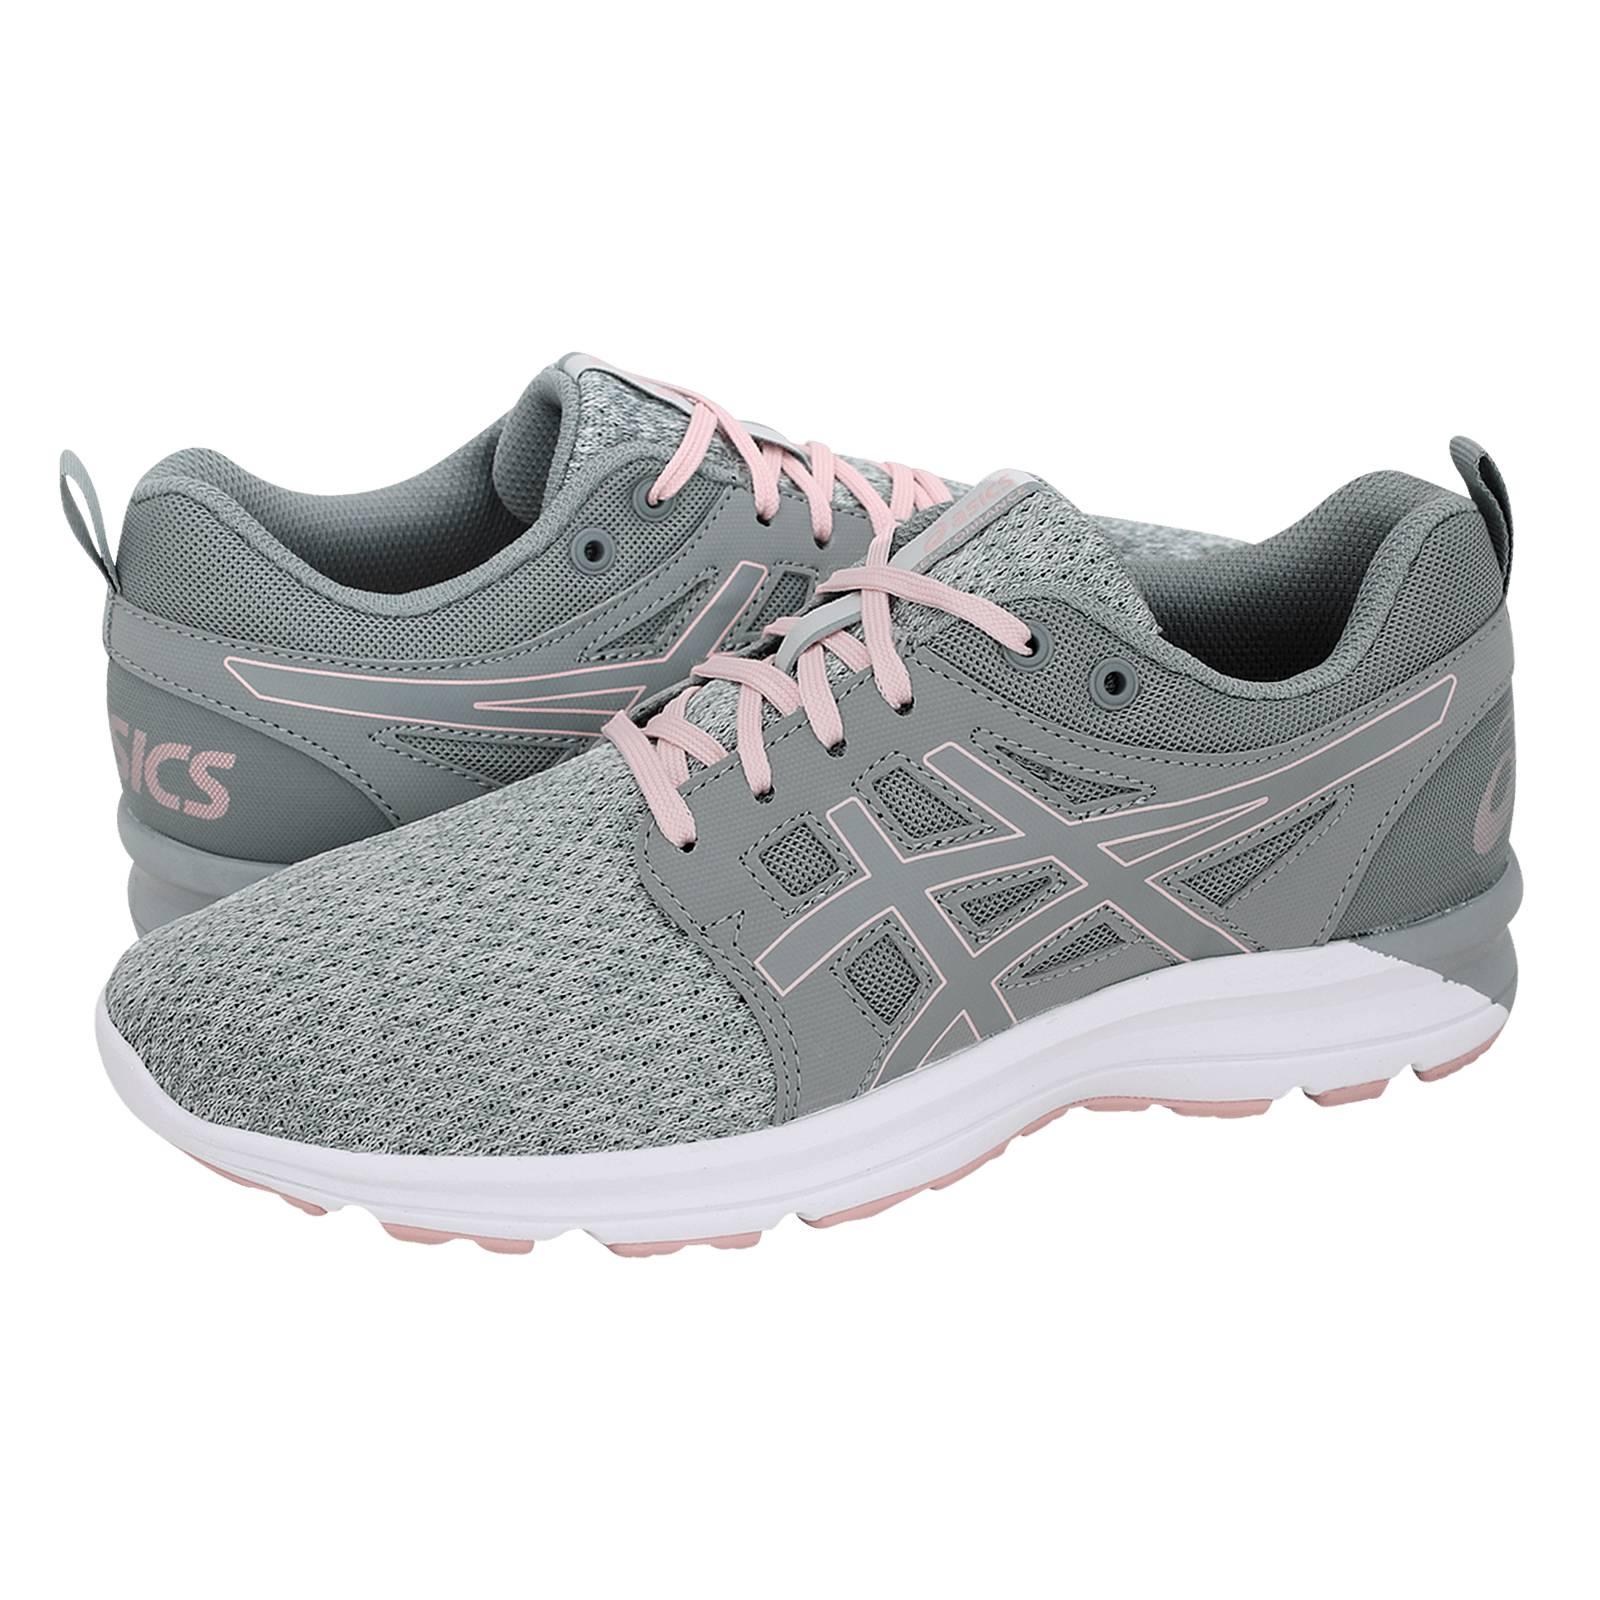 Gel Torrance - Γυναικεία αθλητικά παπούτσια Asics από υφασμα και ... f0b25ddc957